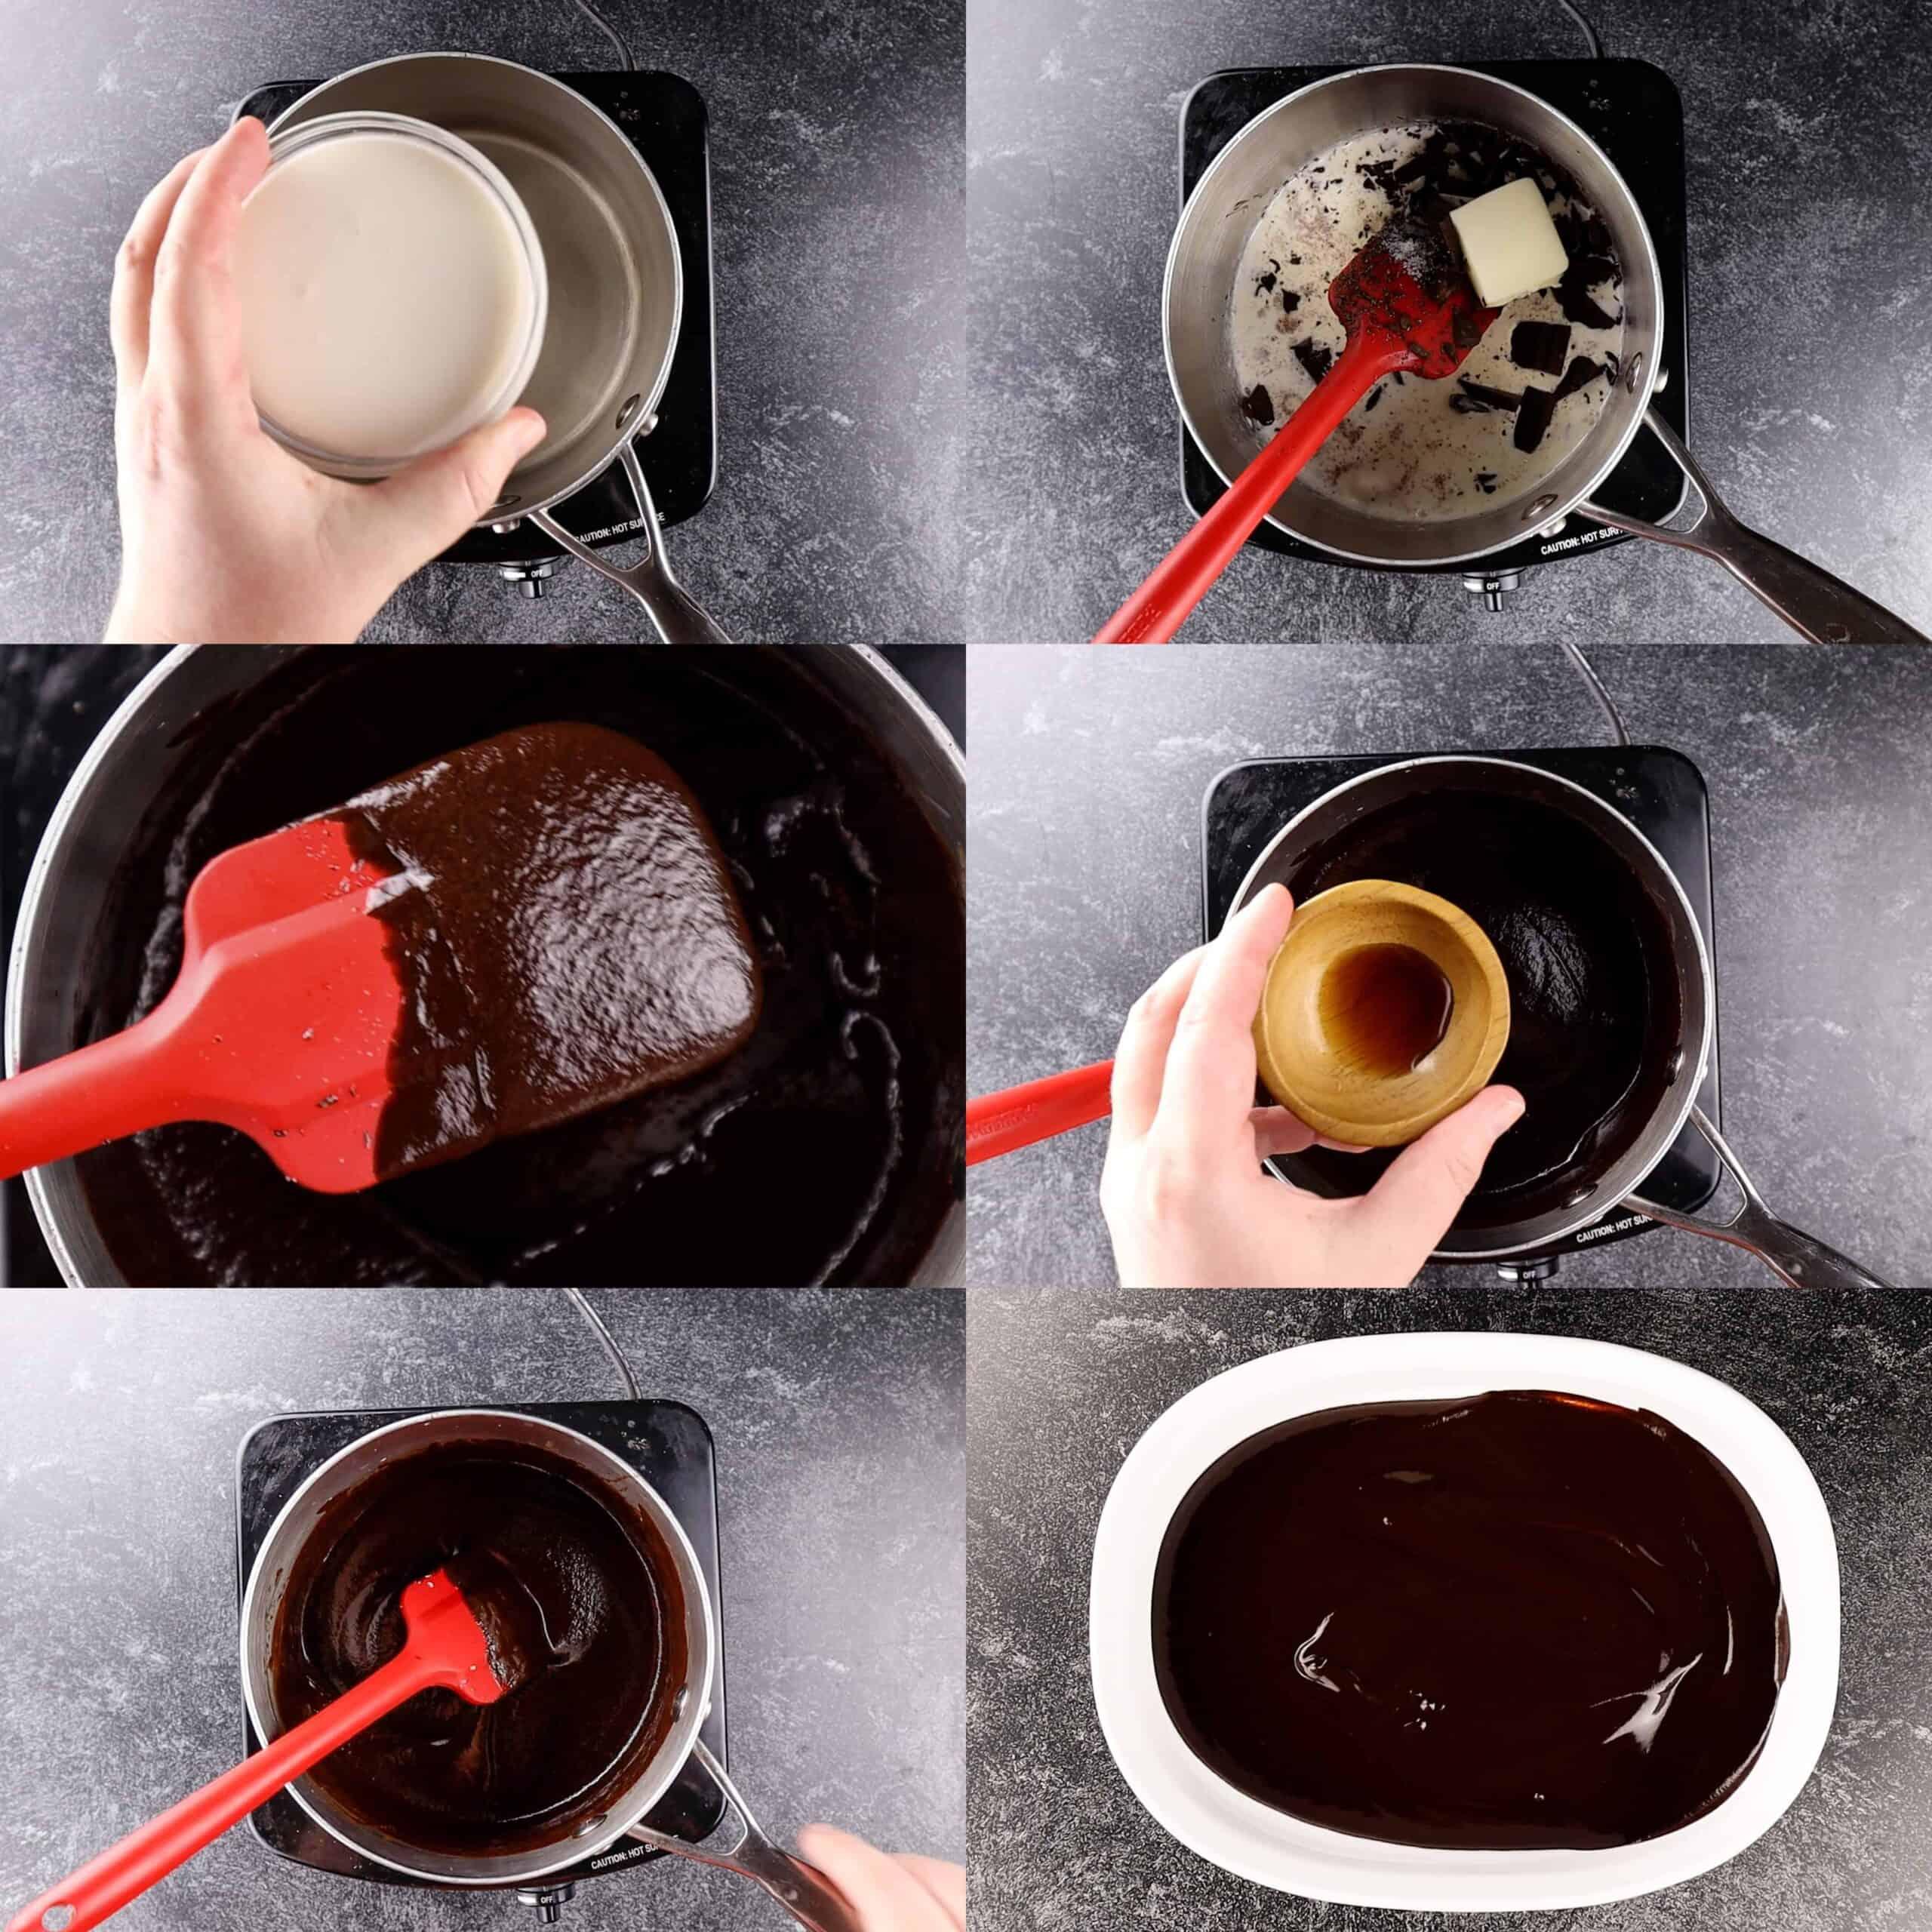 chocolate truffles process shots making truffles